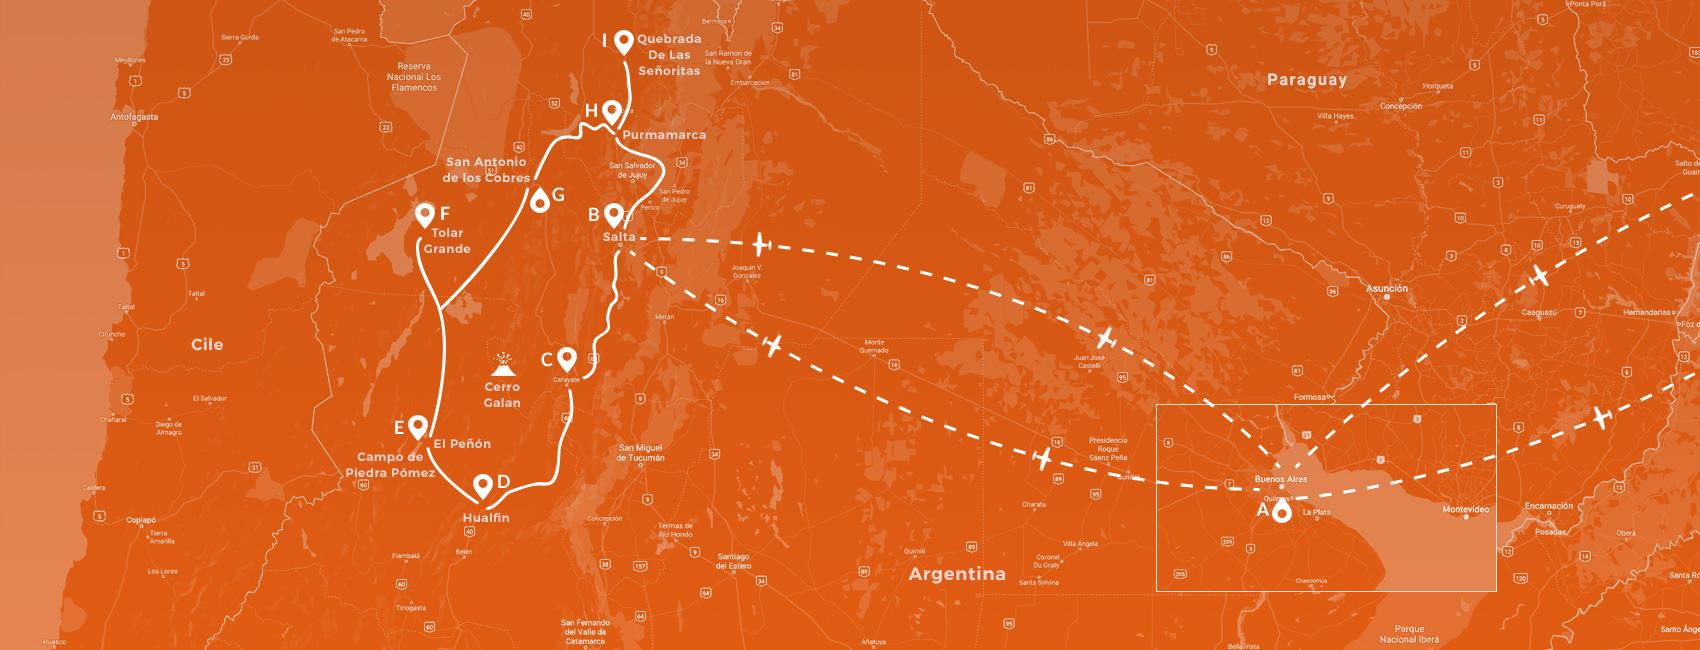 Maps - Argentina - I meravigliosi paesaggi della Puna